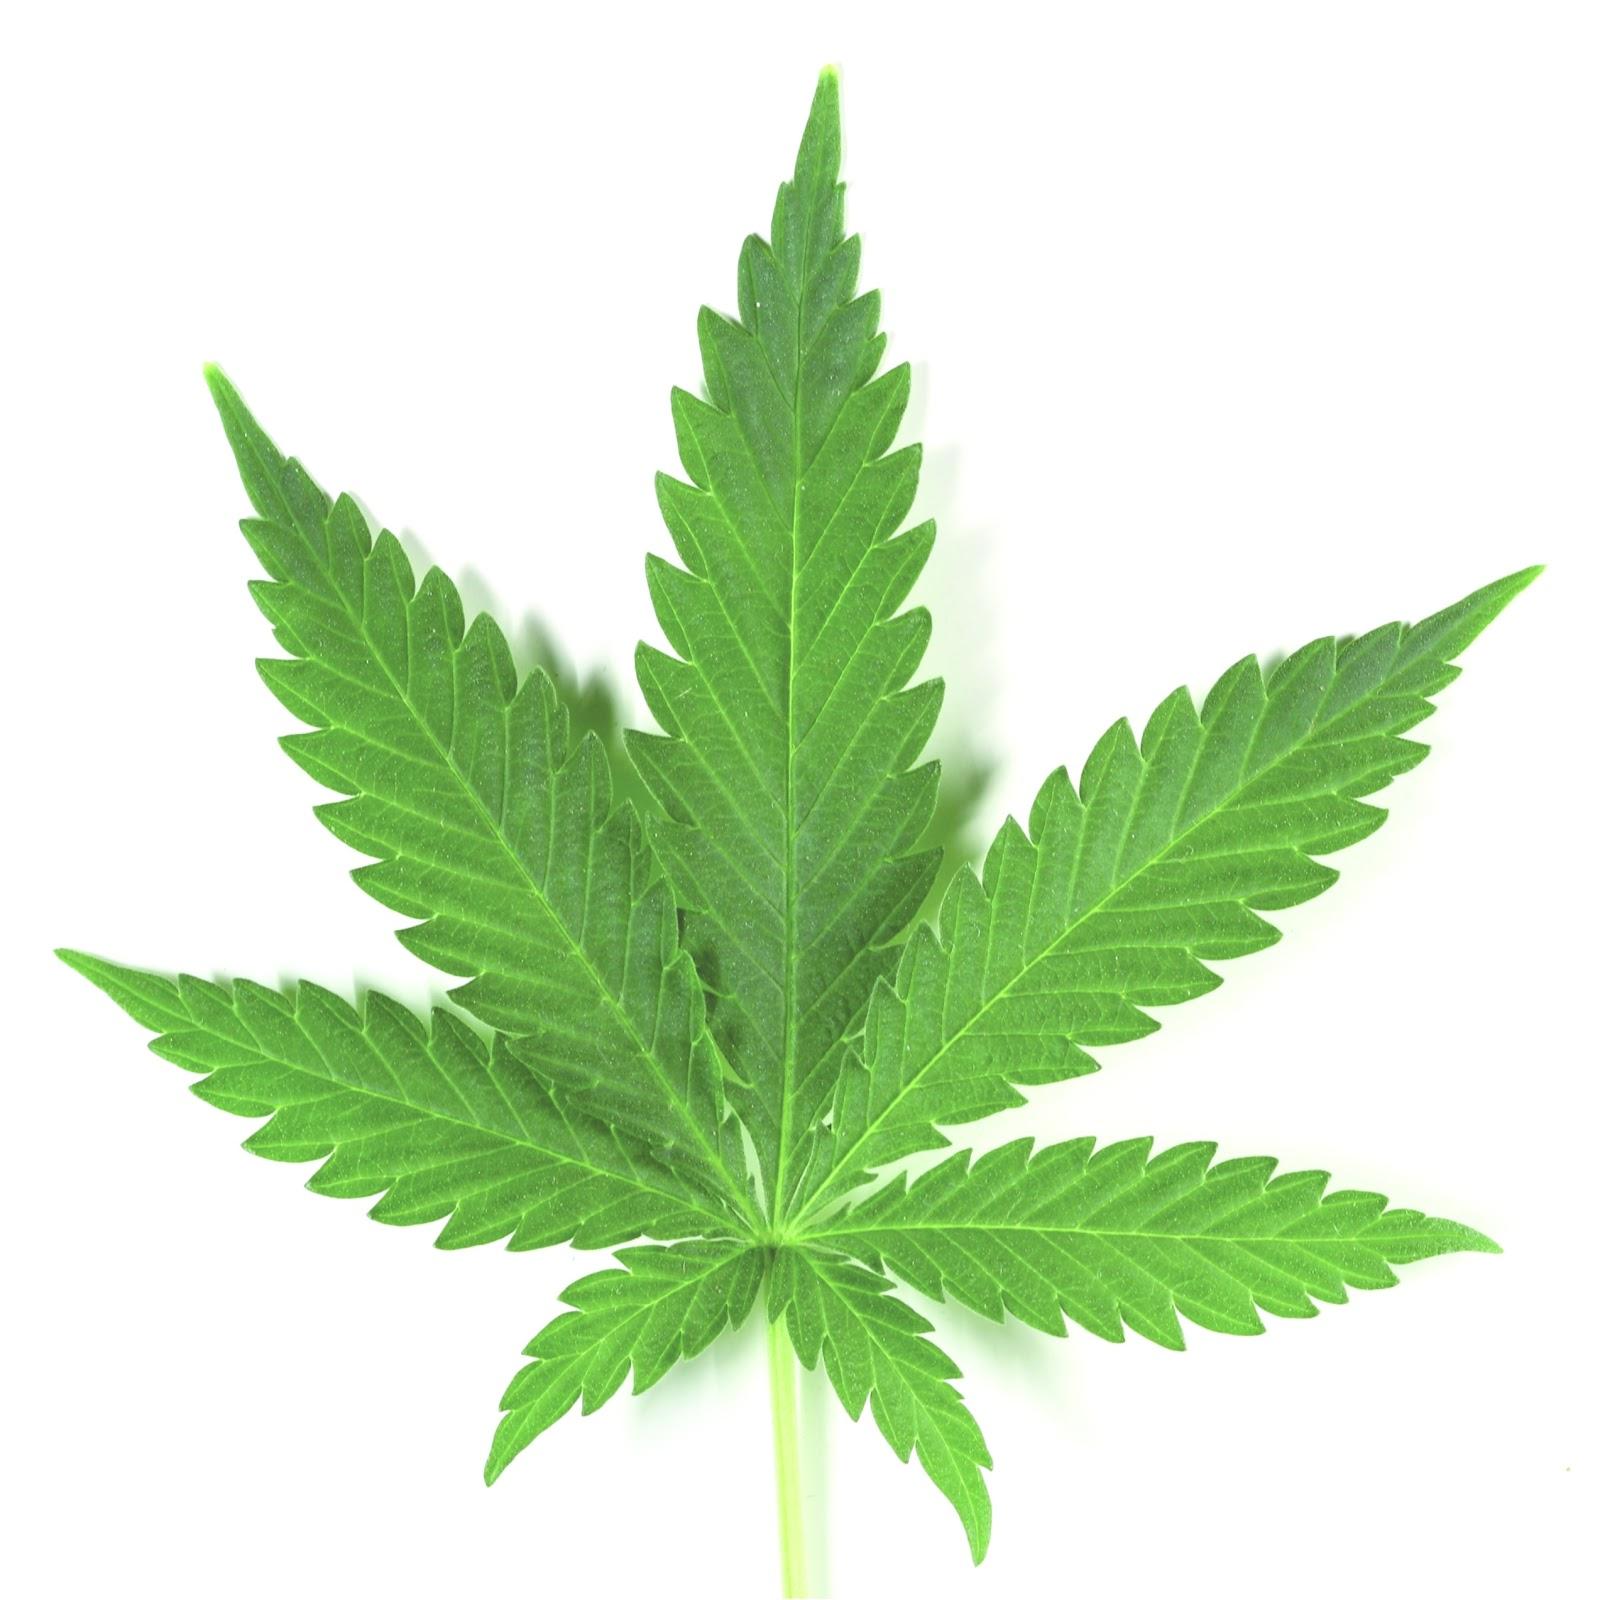 http://notasdehumo.com/wp-content/uploads/infusion-marihuana-3.jpg